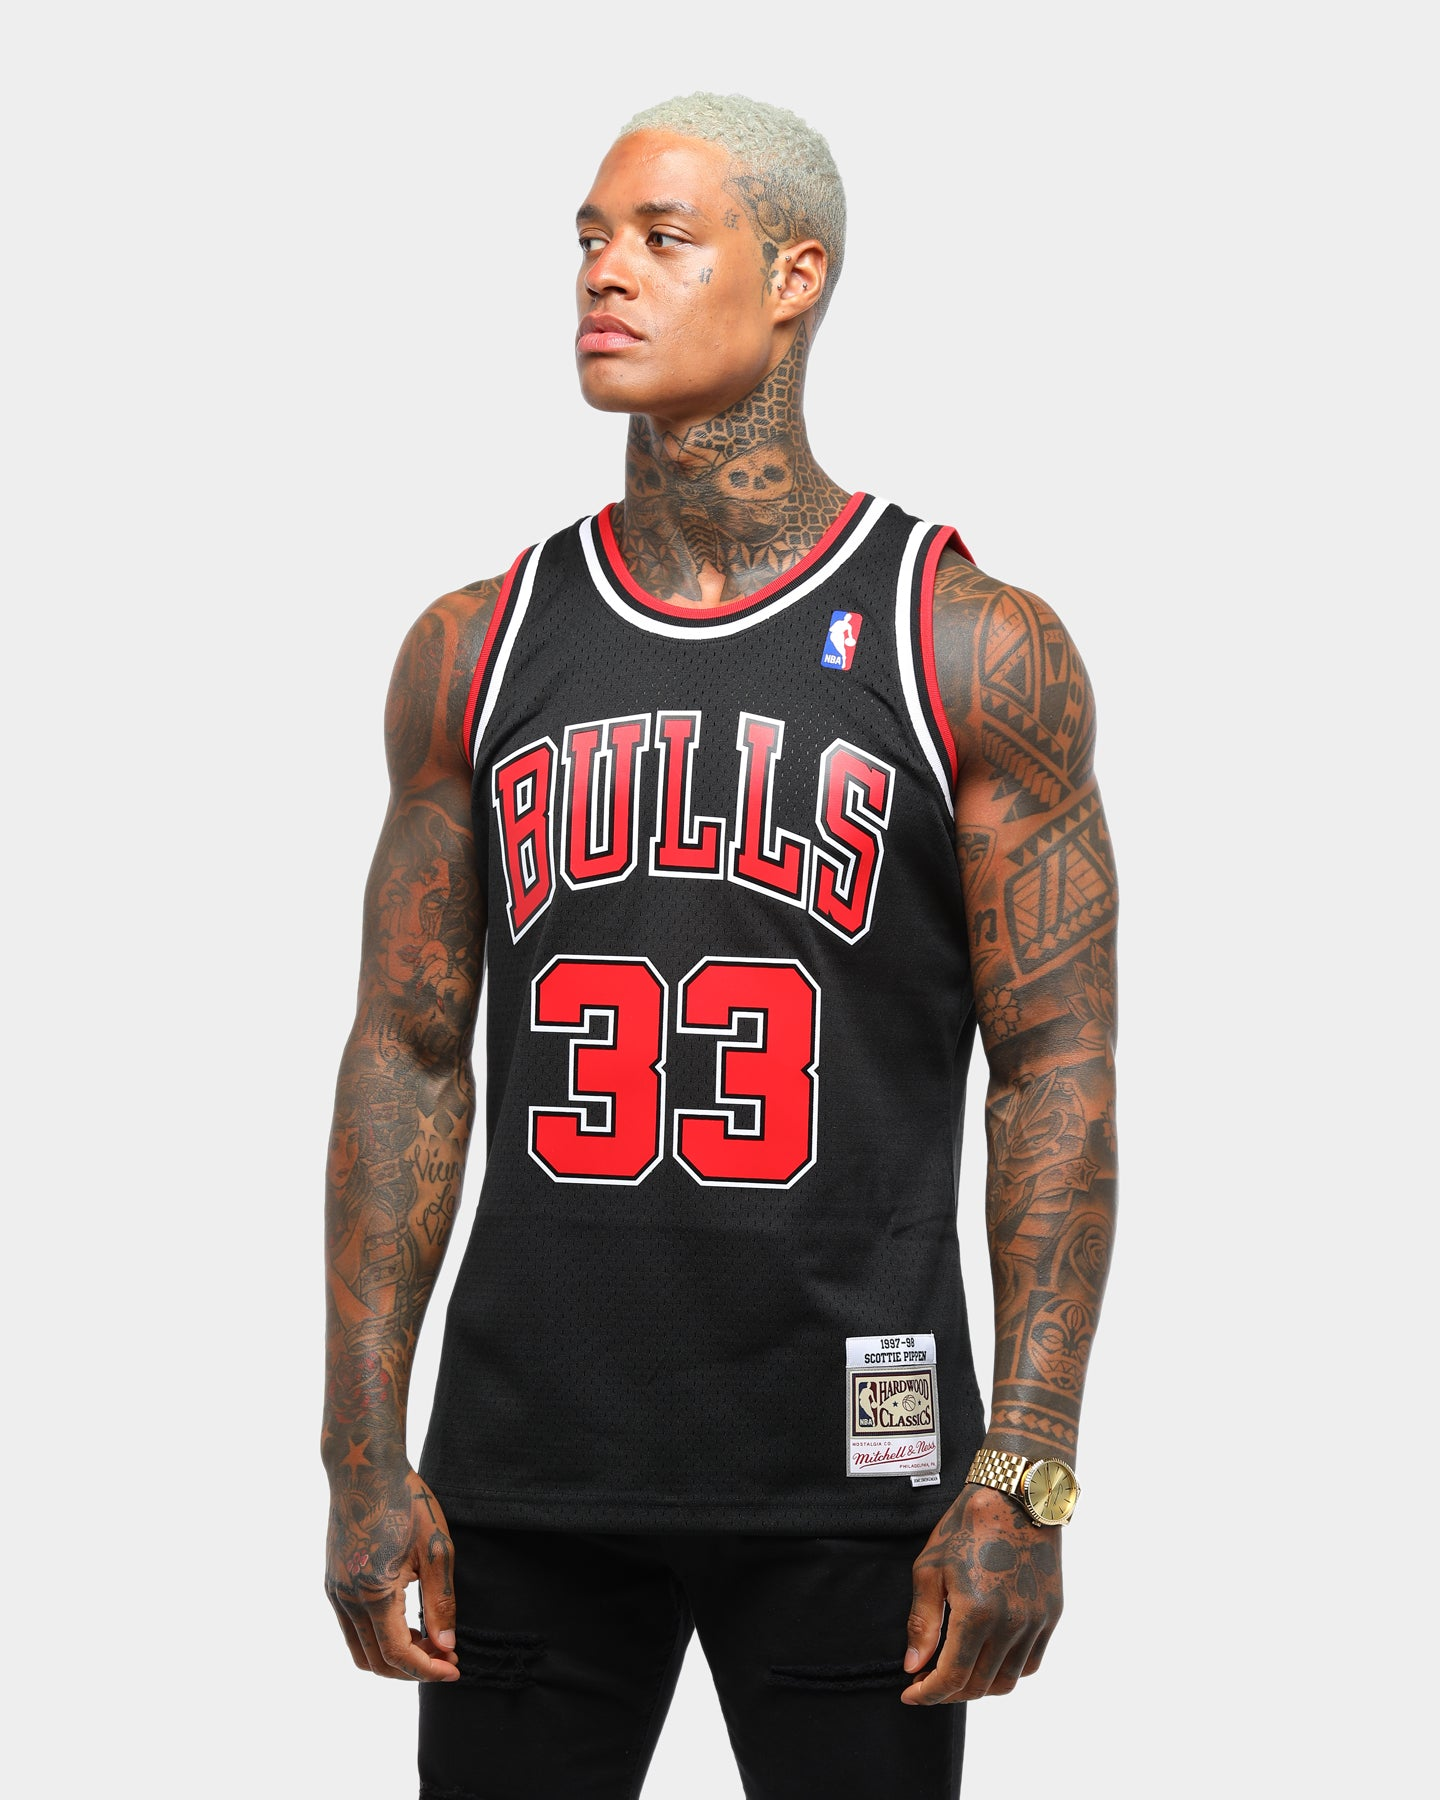 Scottie Pippen #33 Chicago Bulls Vintage Throwback Swingman Jersey Black